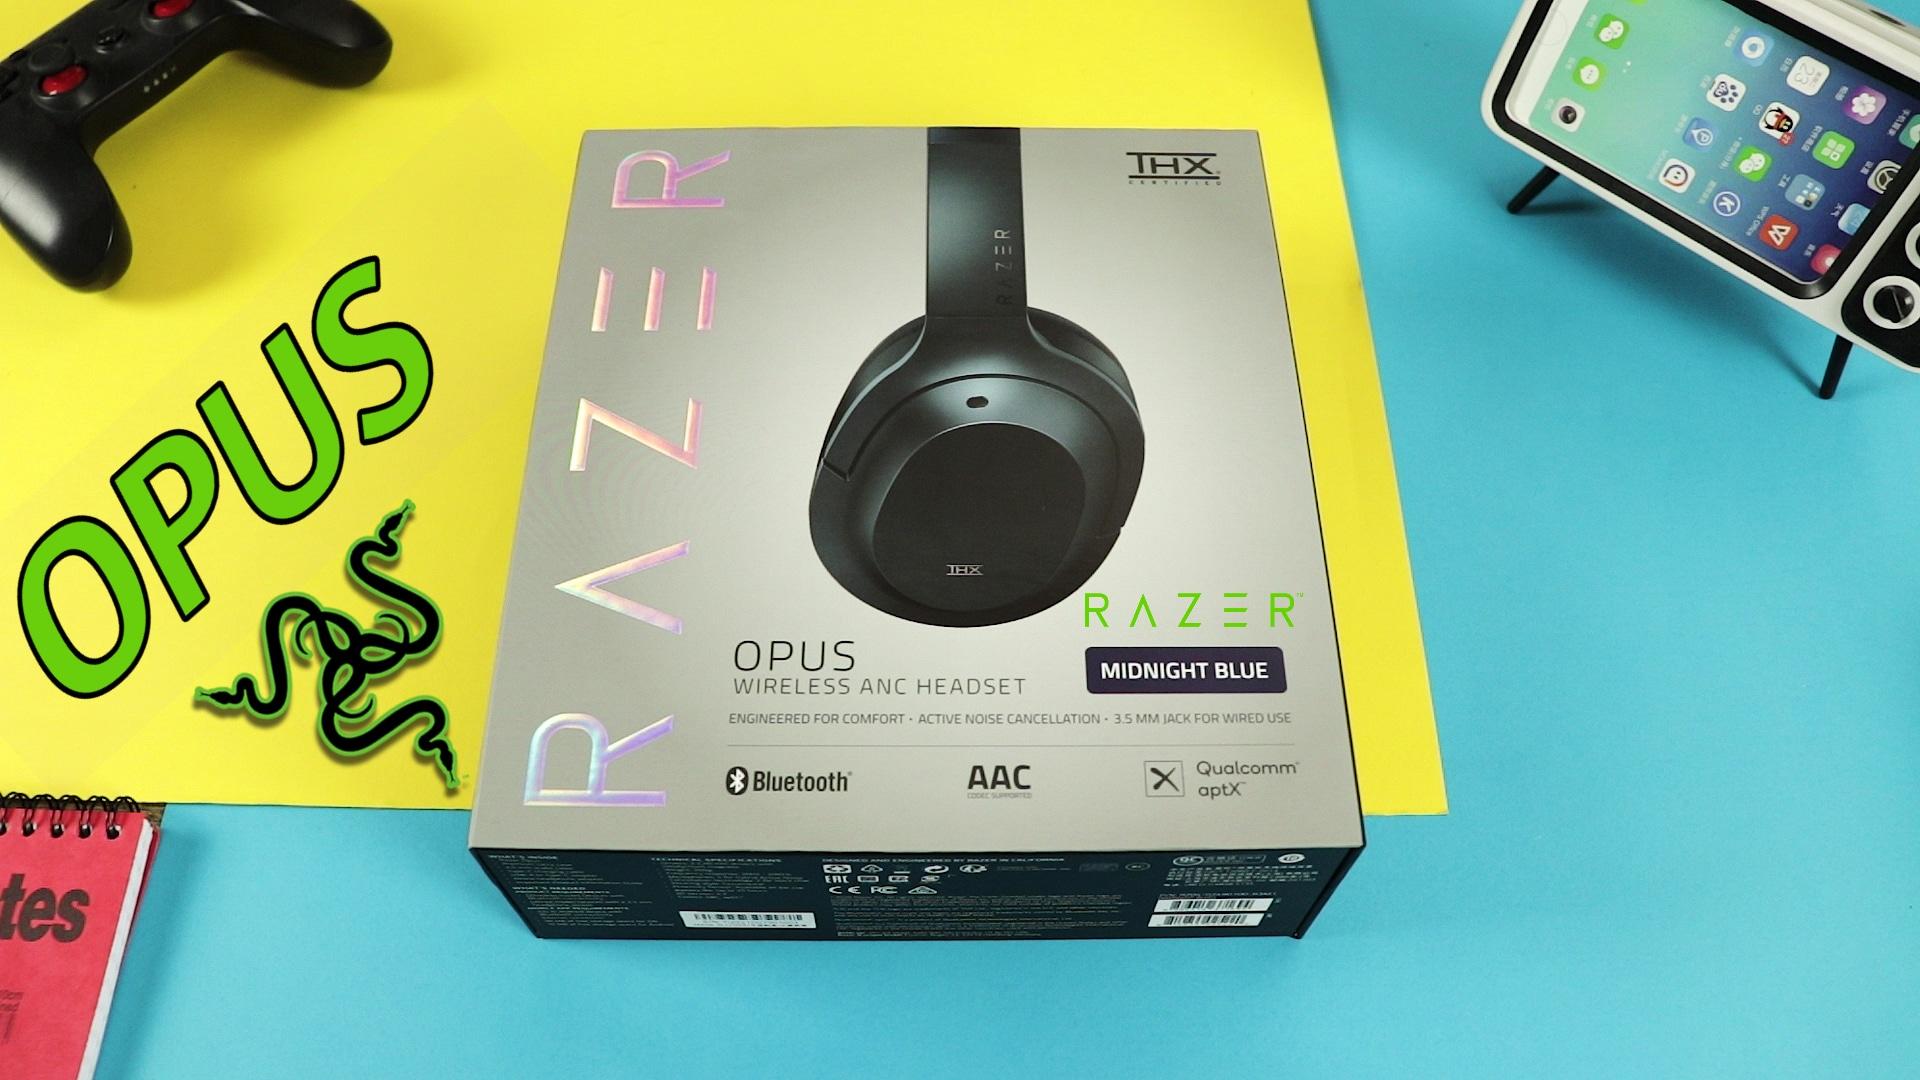 Razer OPUS Ασύρματα Ακουστικά